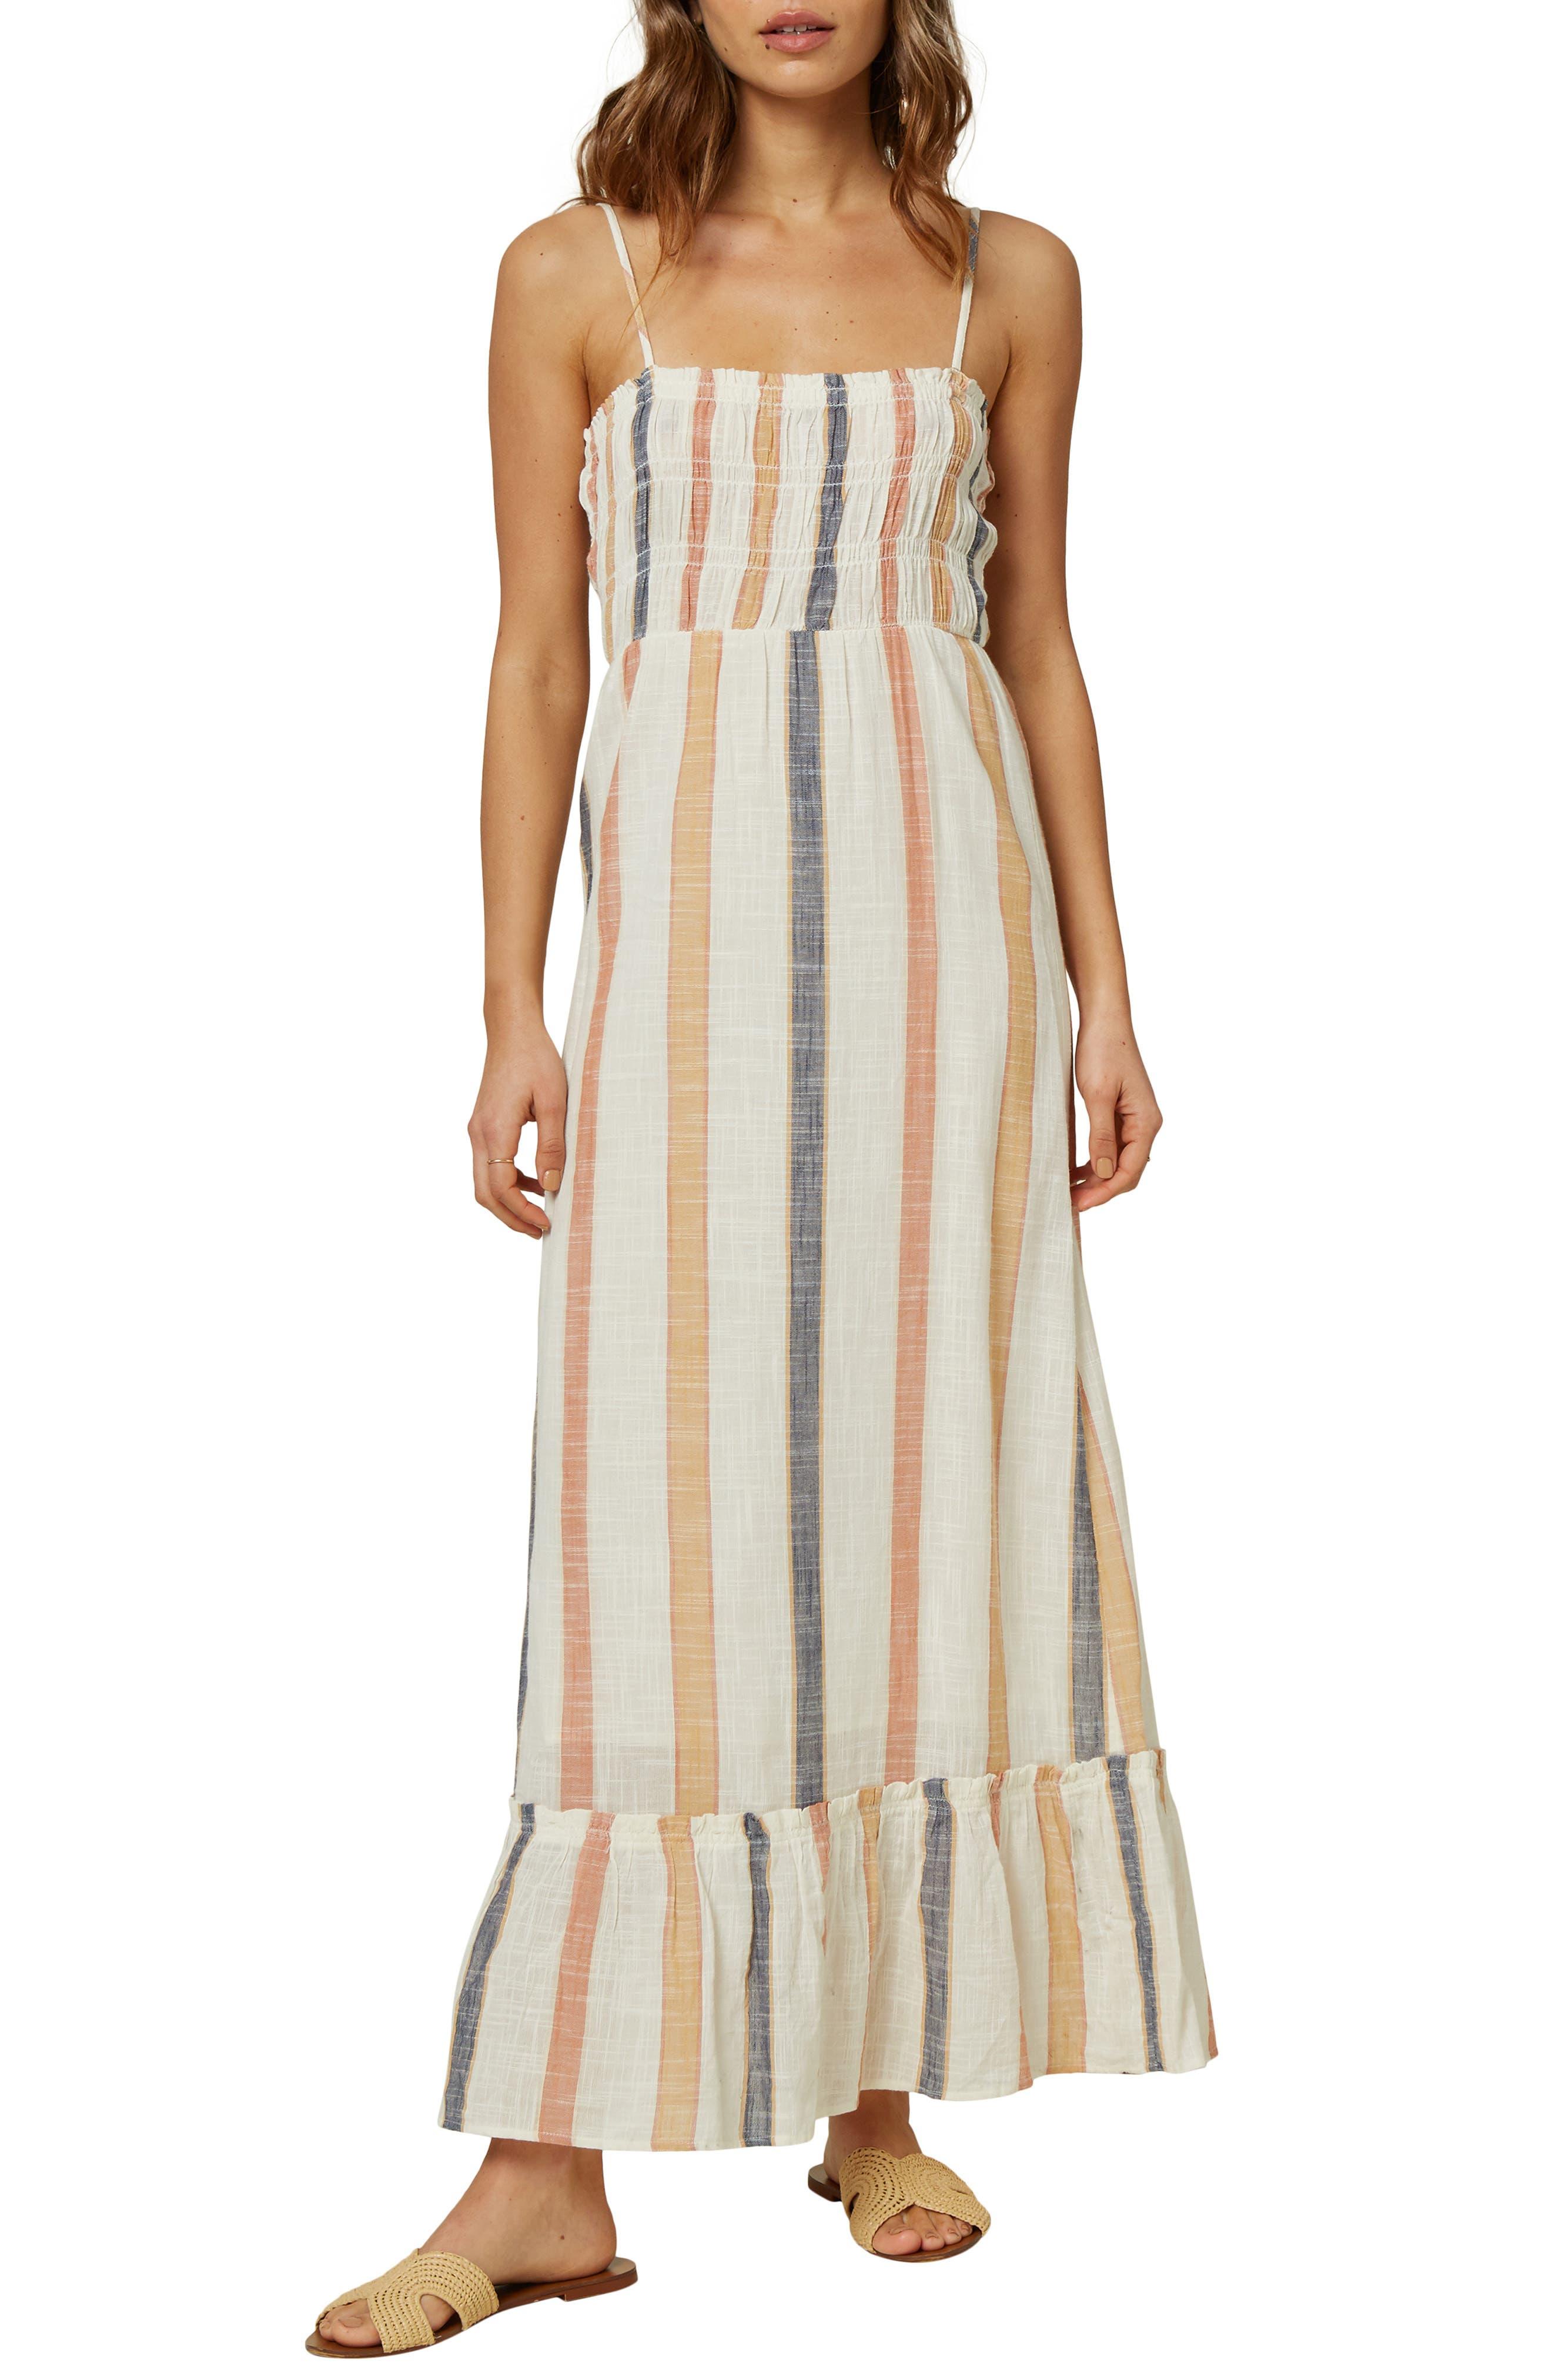 Image of O'Neill Lane Striped Sleeveless Maxi Dress